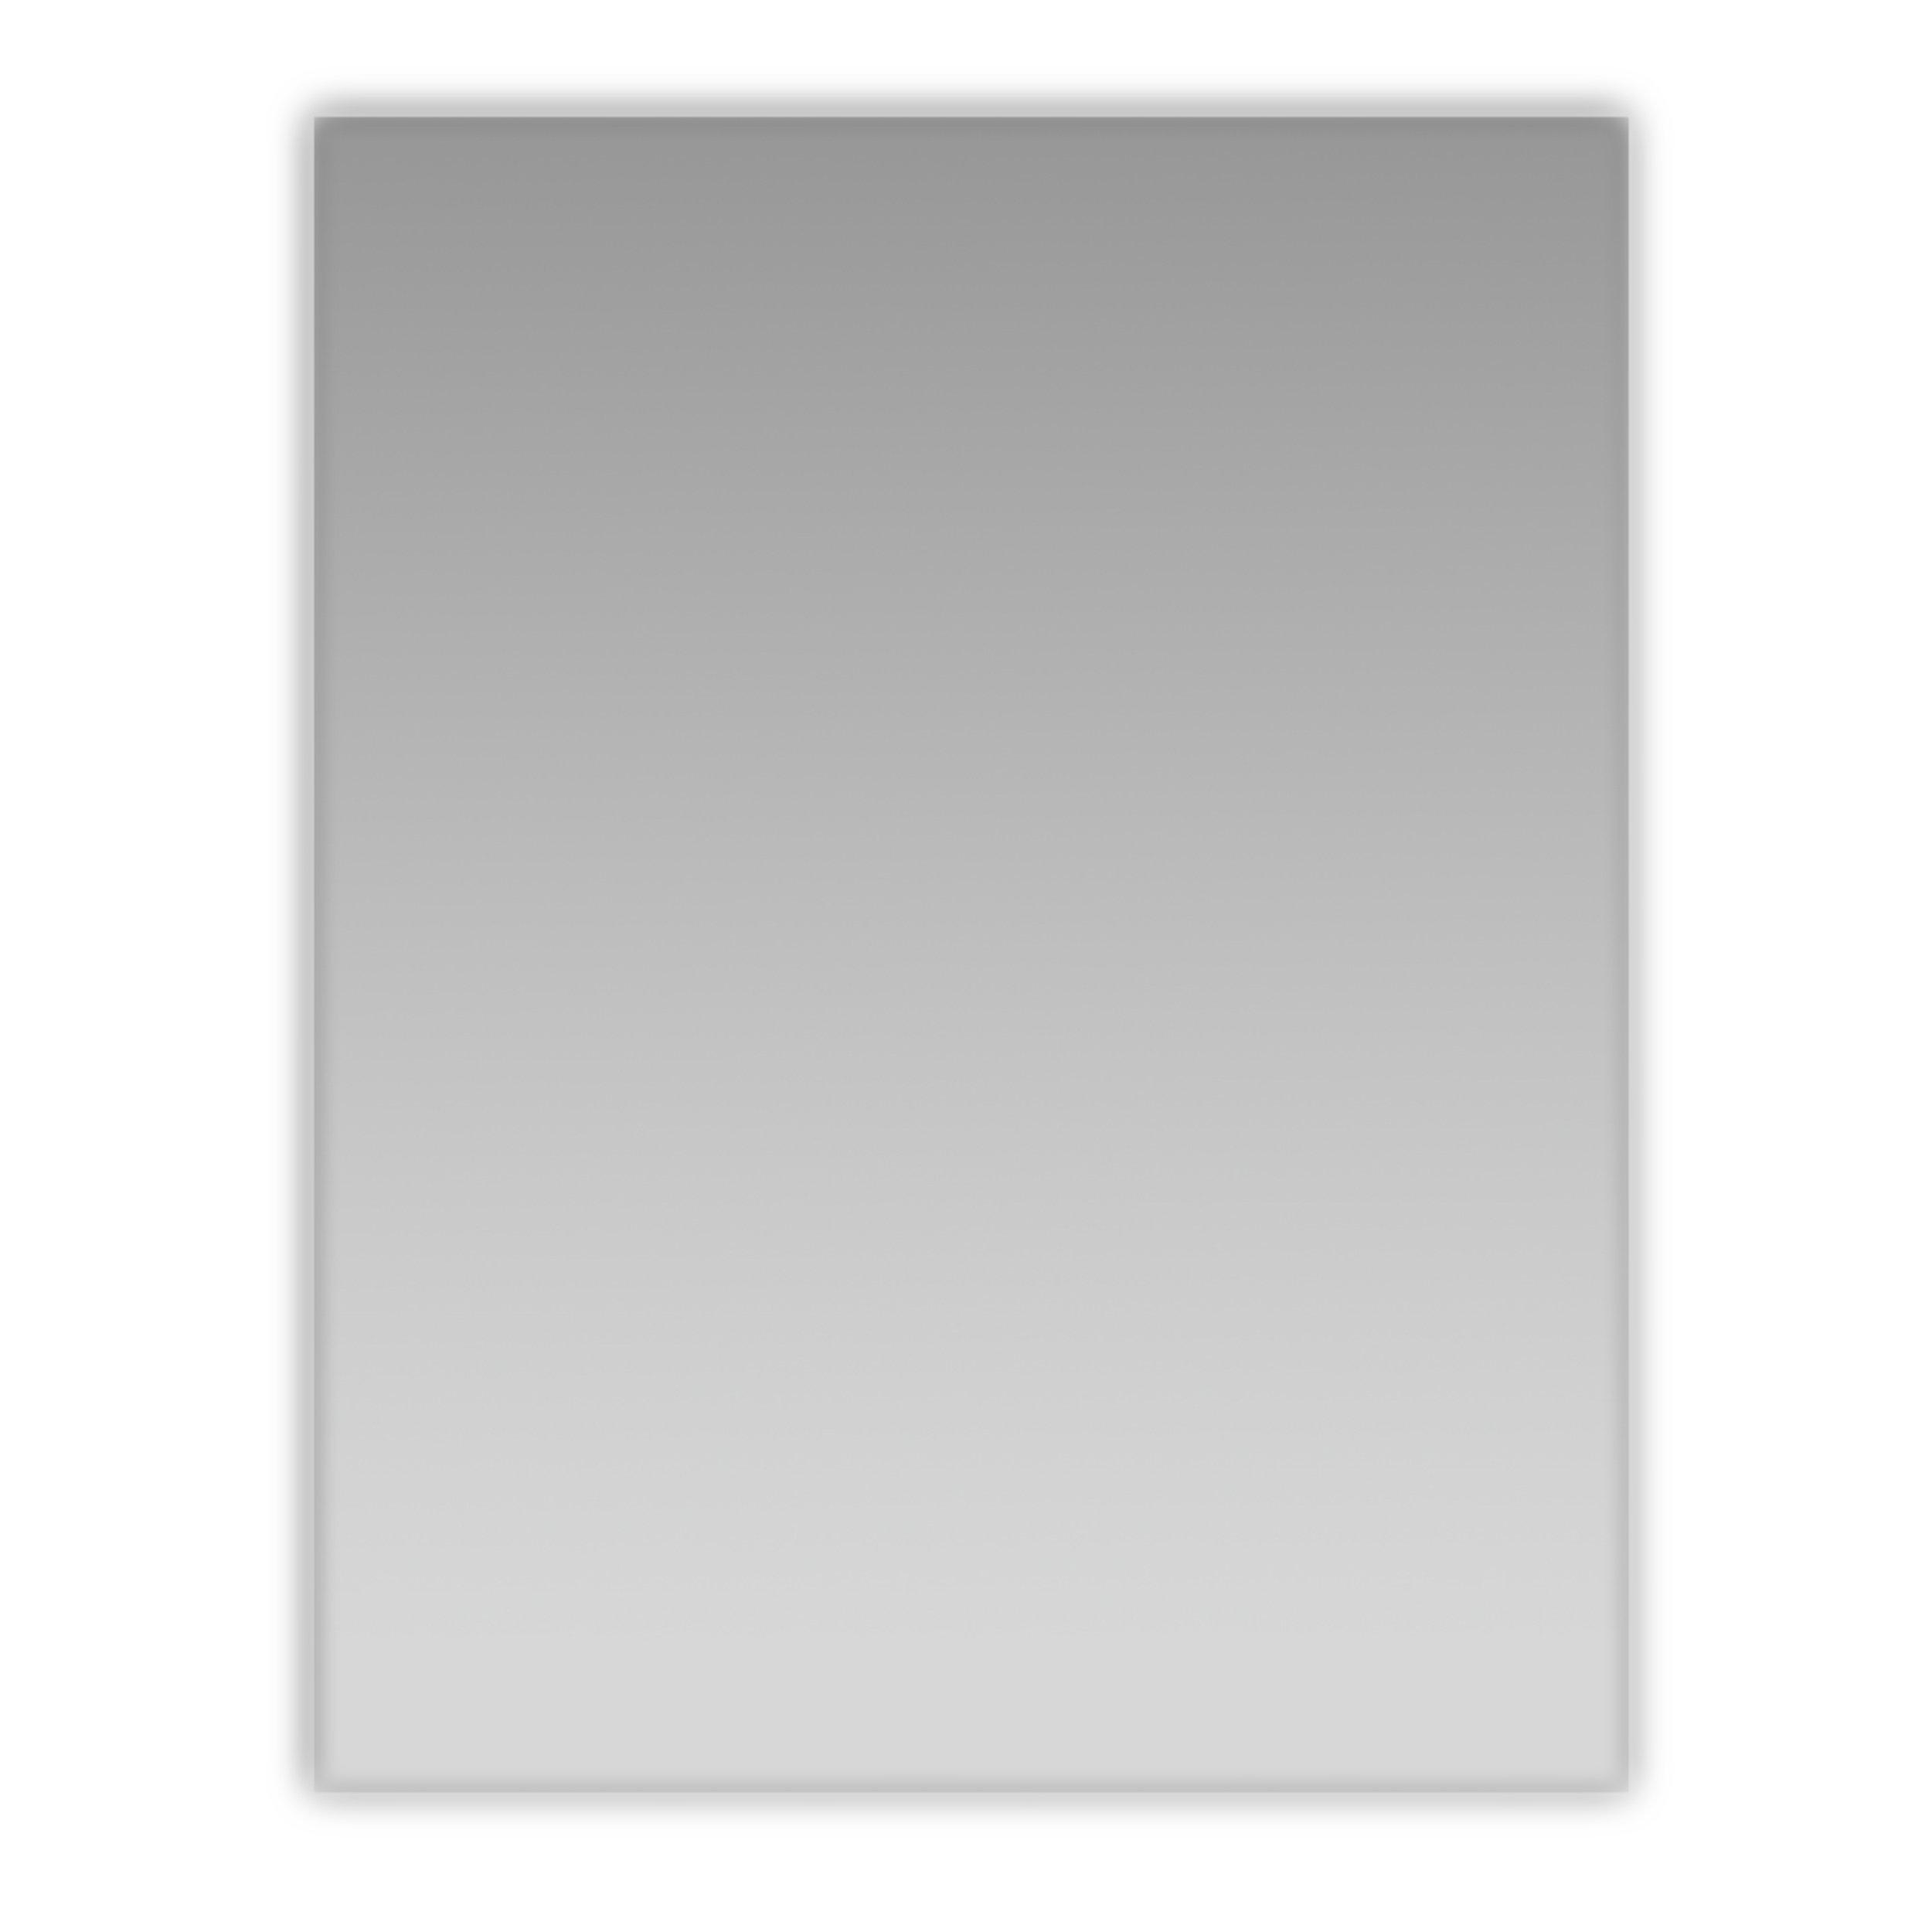 Eviva EVMR05-24X30 Sleek 24'' Frameless Bathroom Mirror Combination, Glass